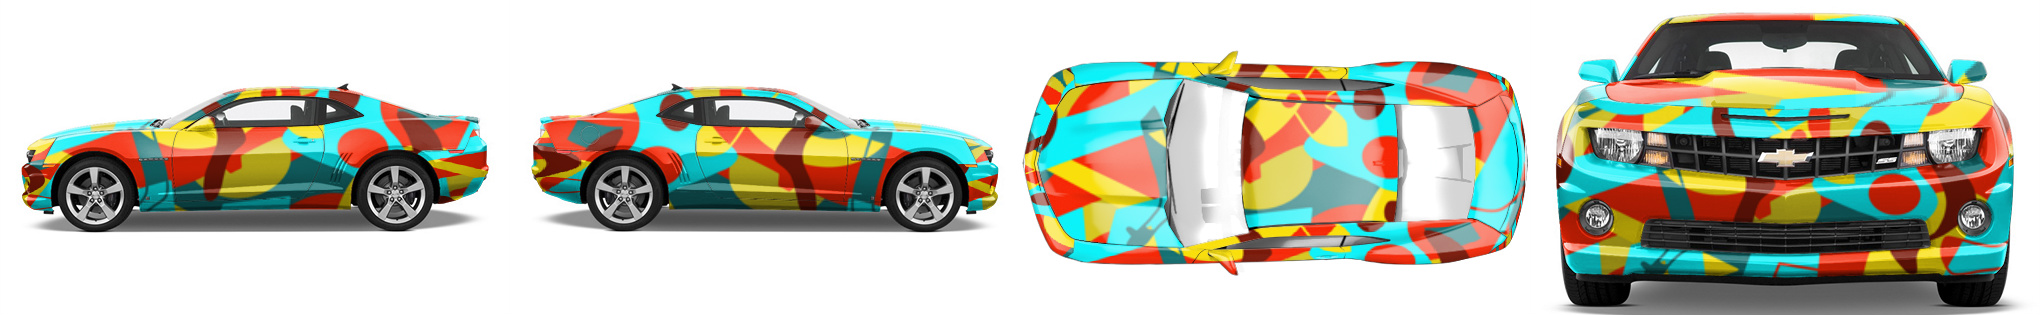 Muscle Car Wrap #53447